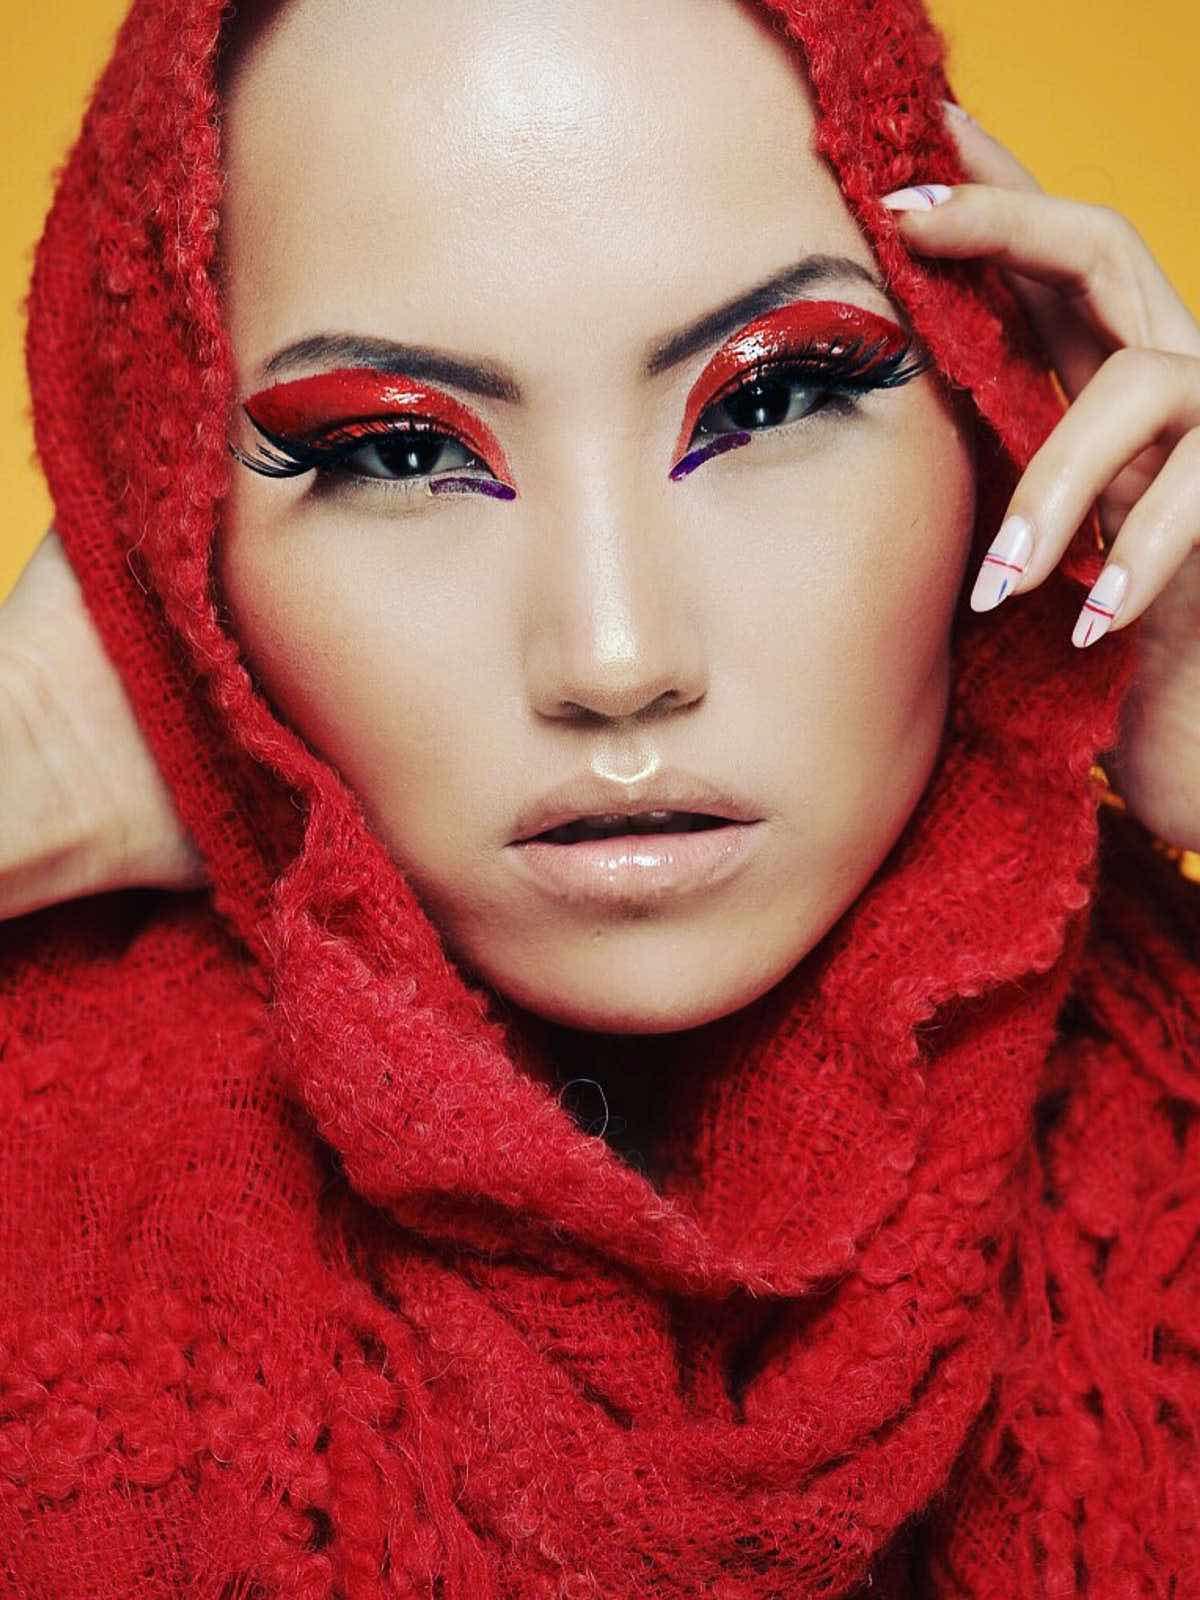 sce-agency-female-model-tia-b-6aaa